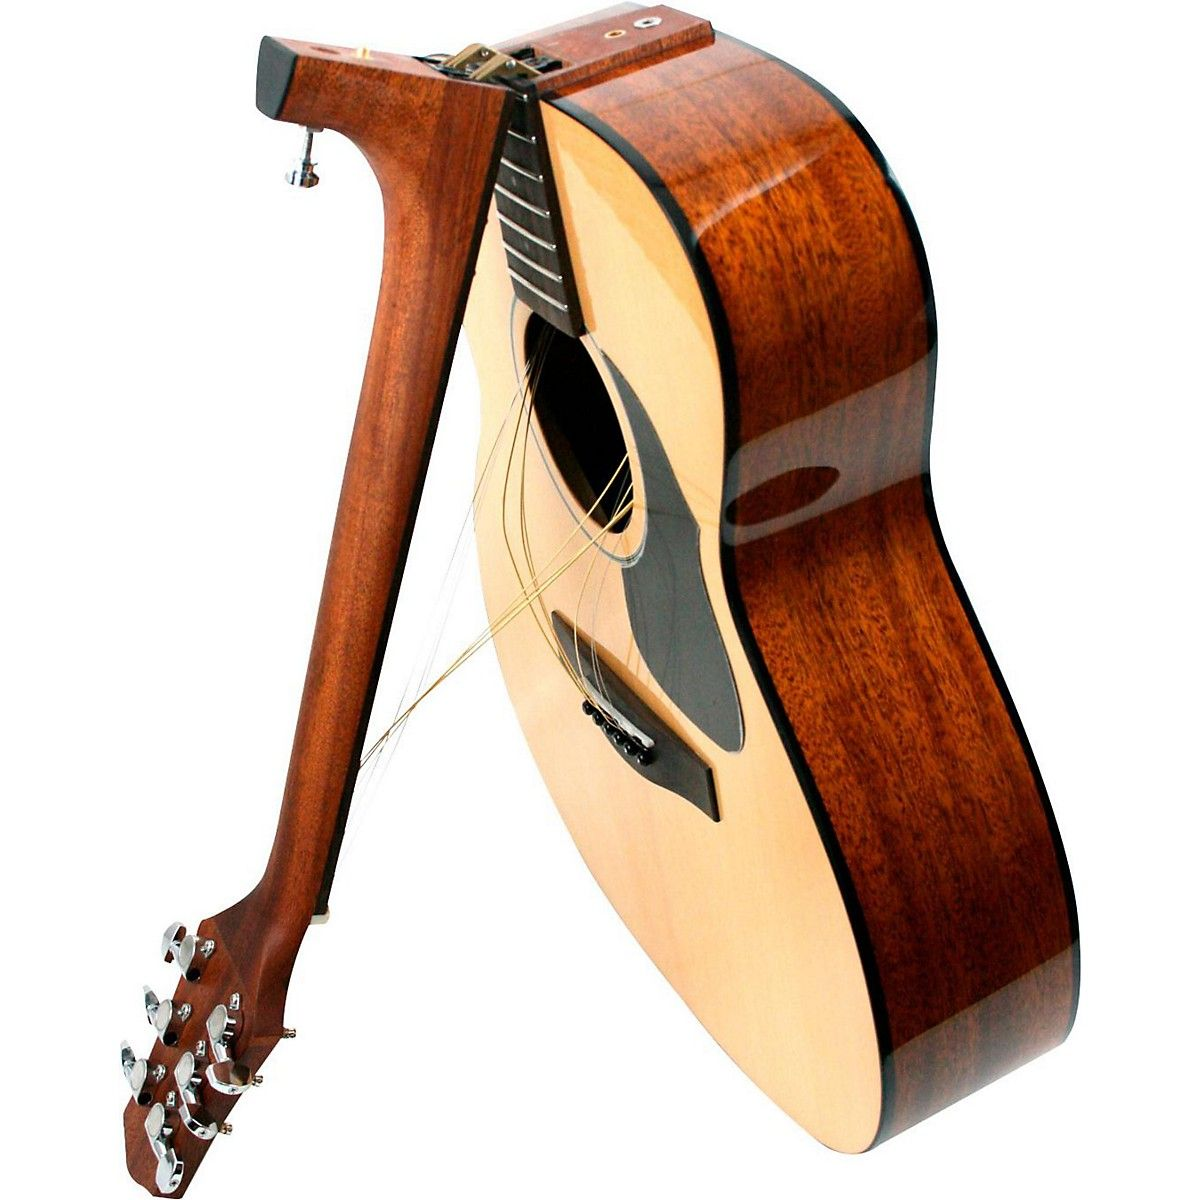 Voyage Air Transit Vaom 02 Travel Acoustic Guitar Guitar Design Acoustic Guitar Guitar